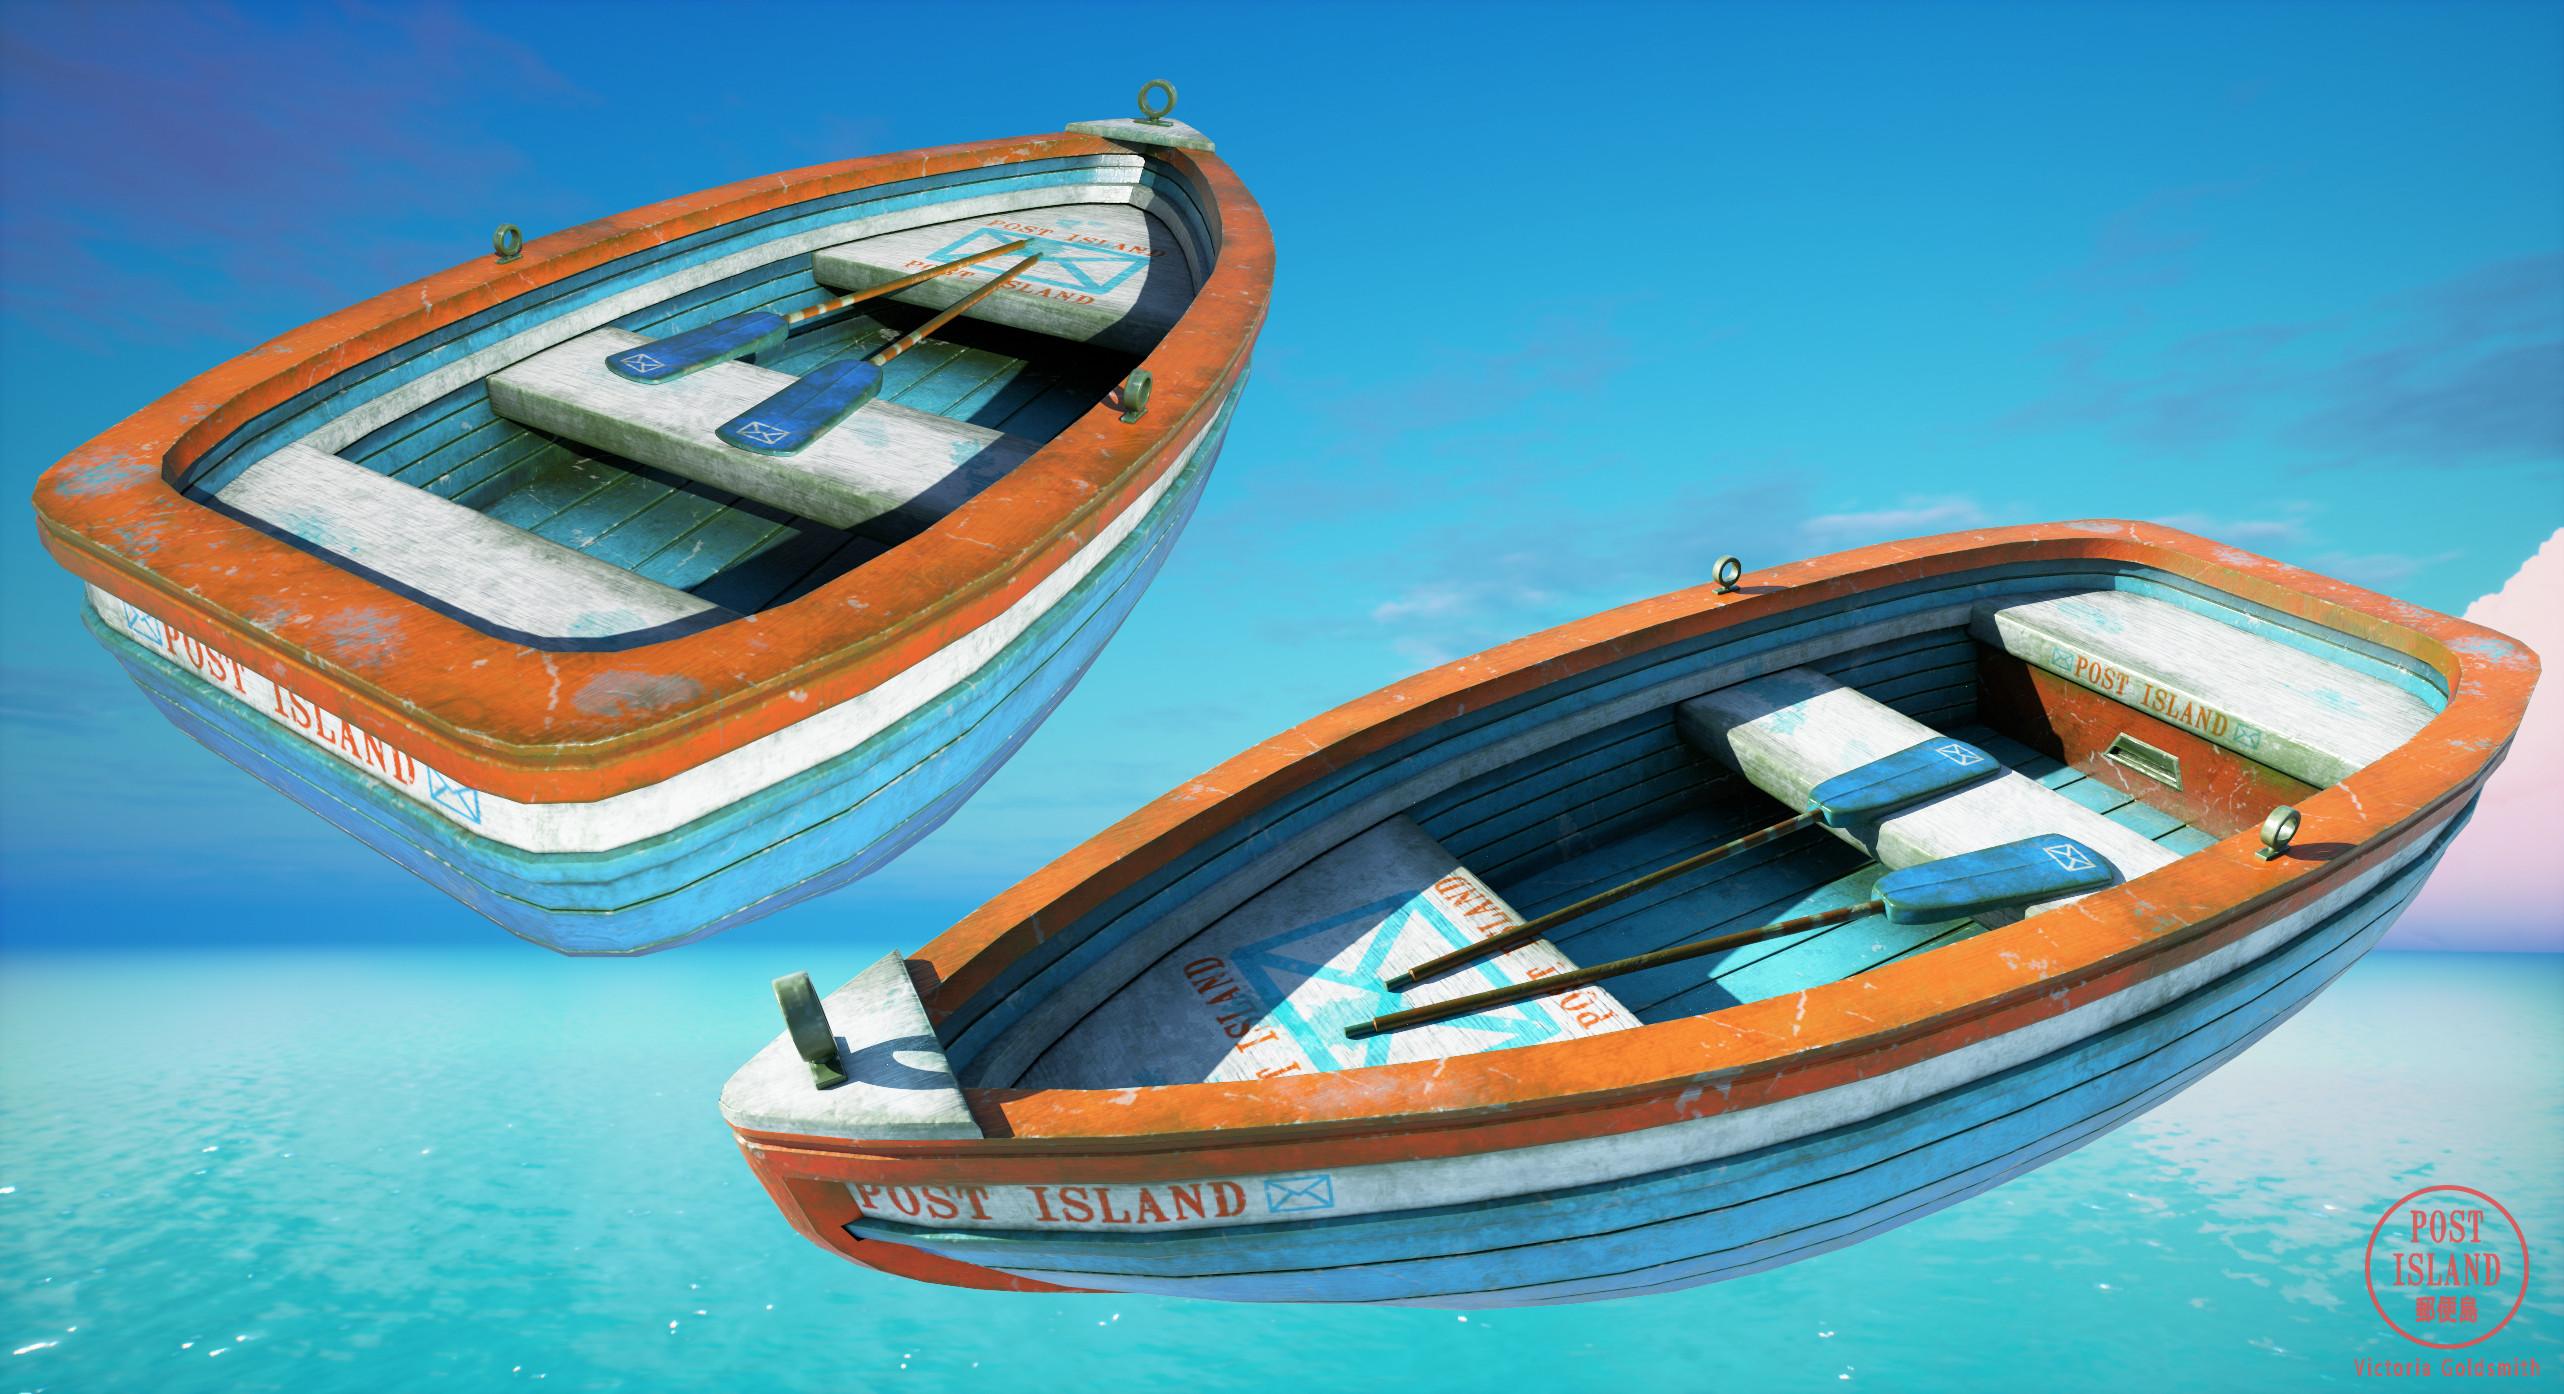 Postman Boat